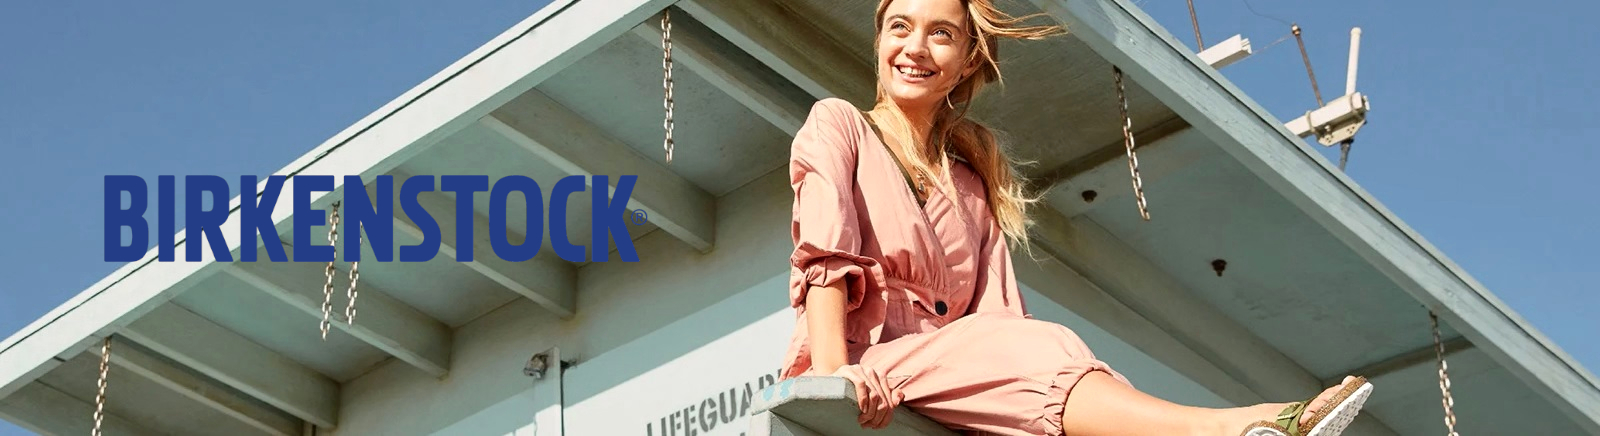 Gisy: Birkenstock Kinderschuhe online shoppen